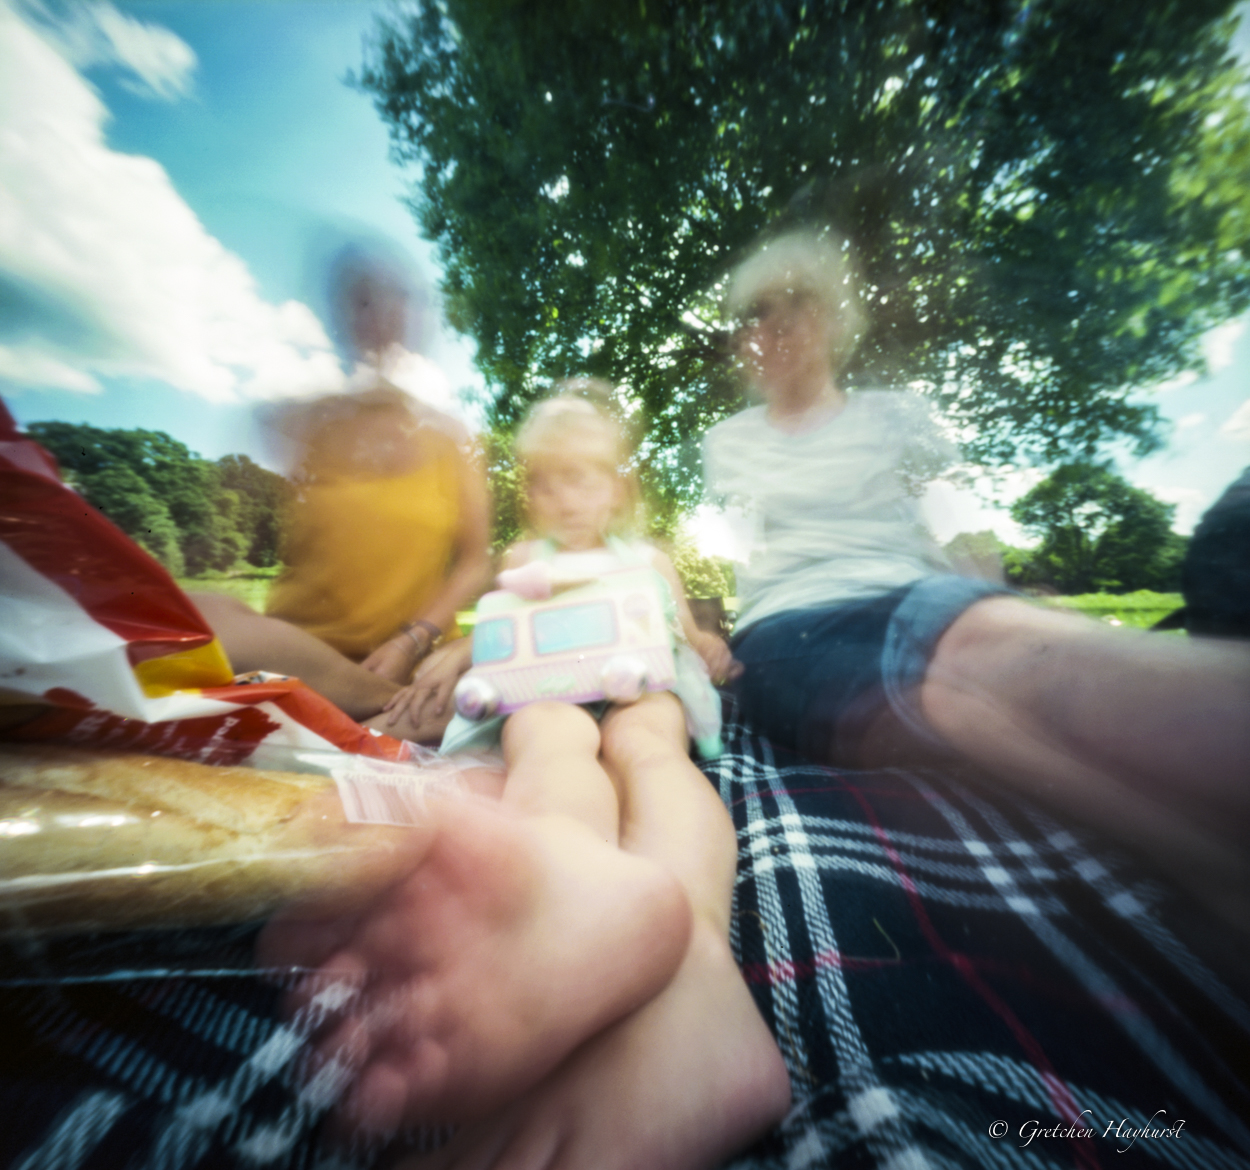 friends in a parkPinhole Photography GretchenHayhurst, Madeon23rd blog